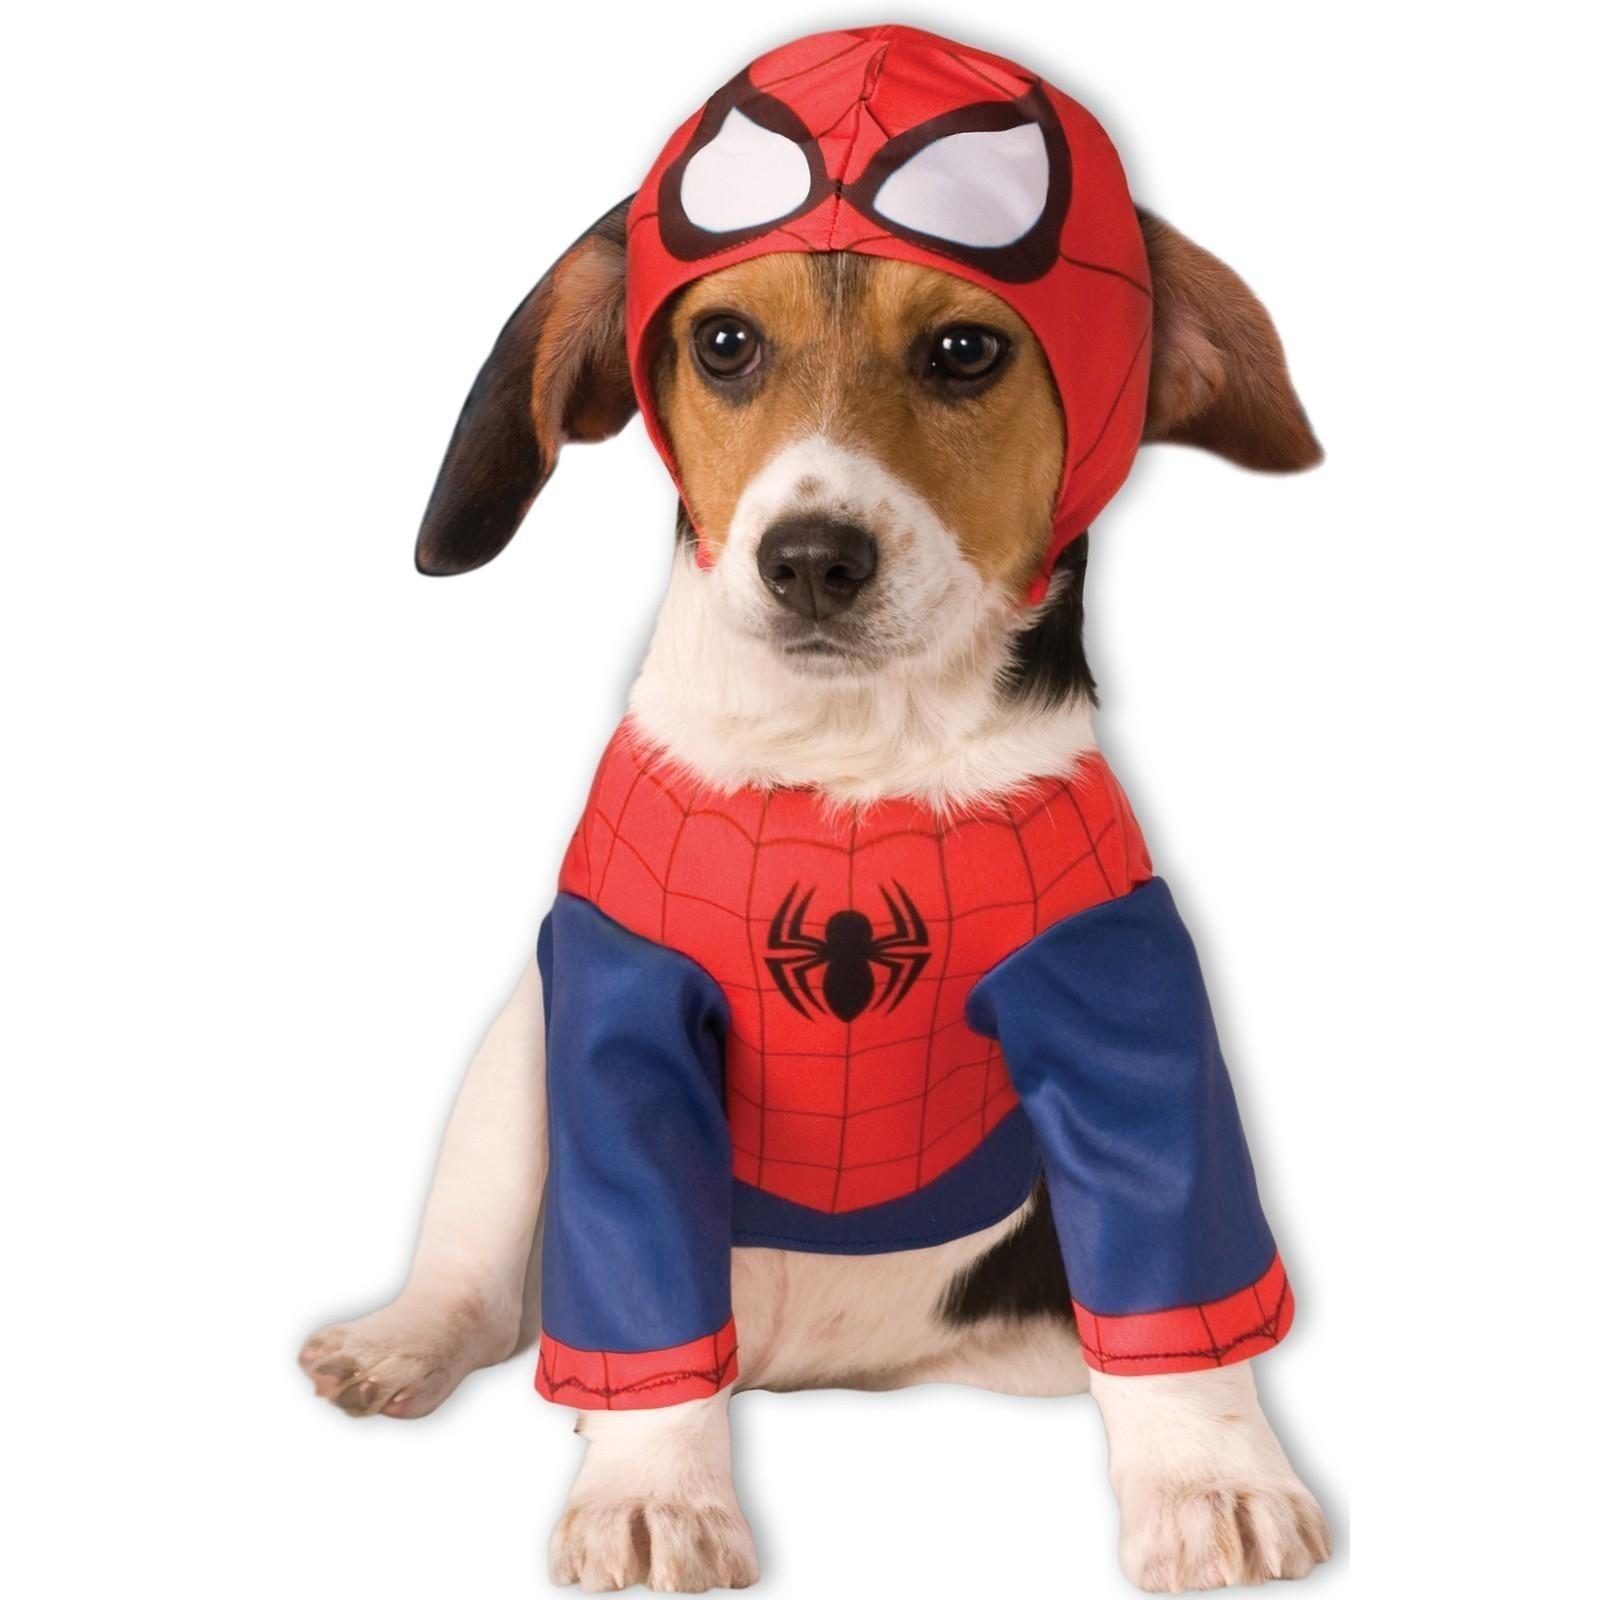 funny dog costumes - 1000×1000